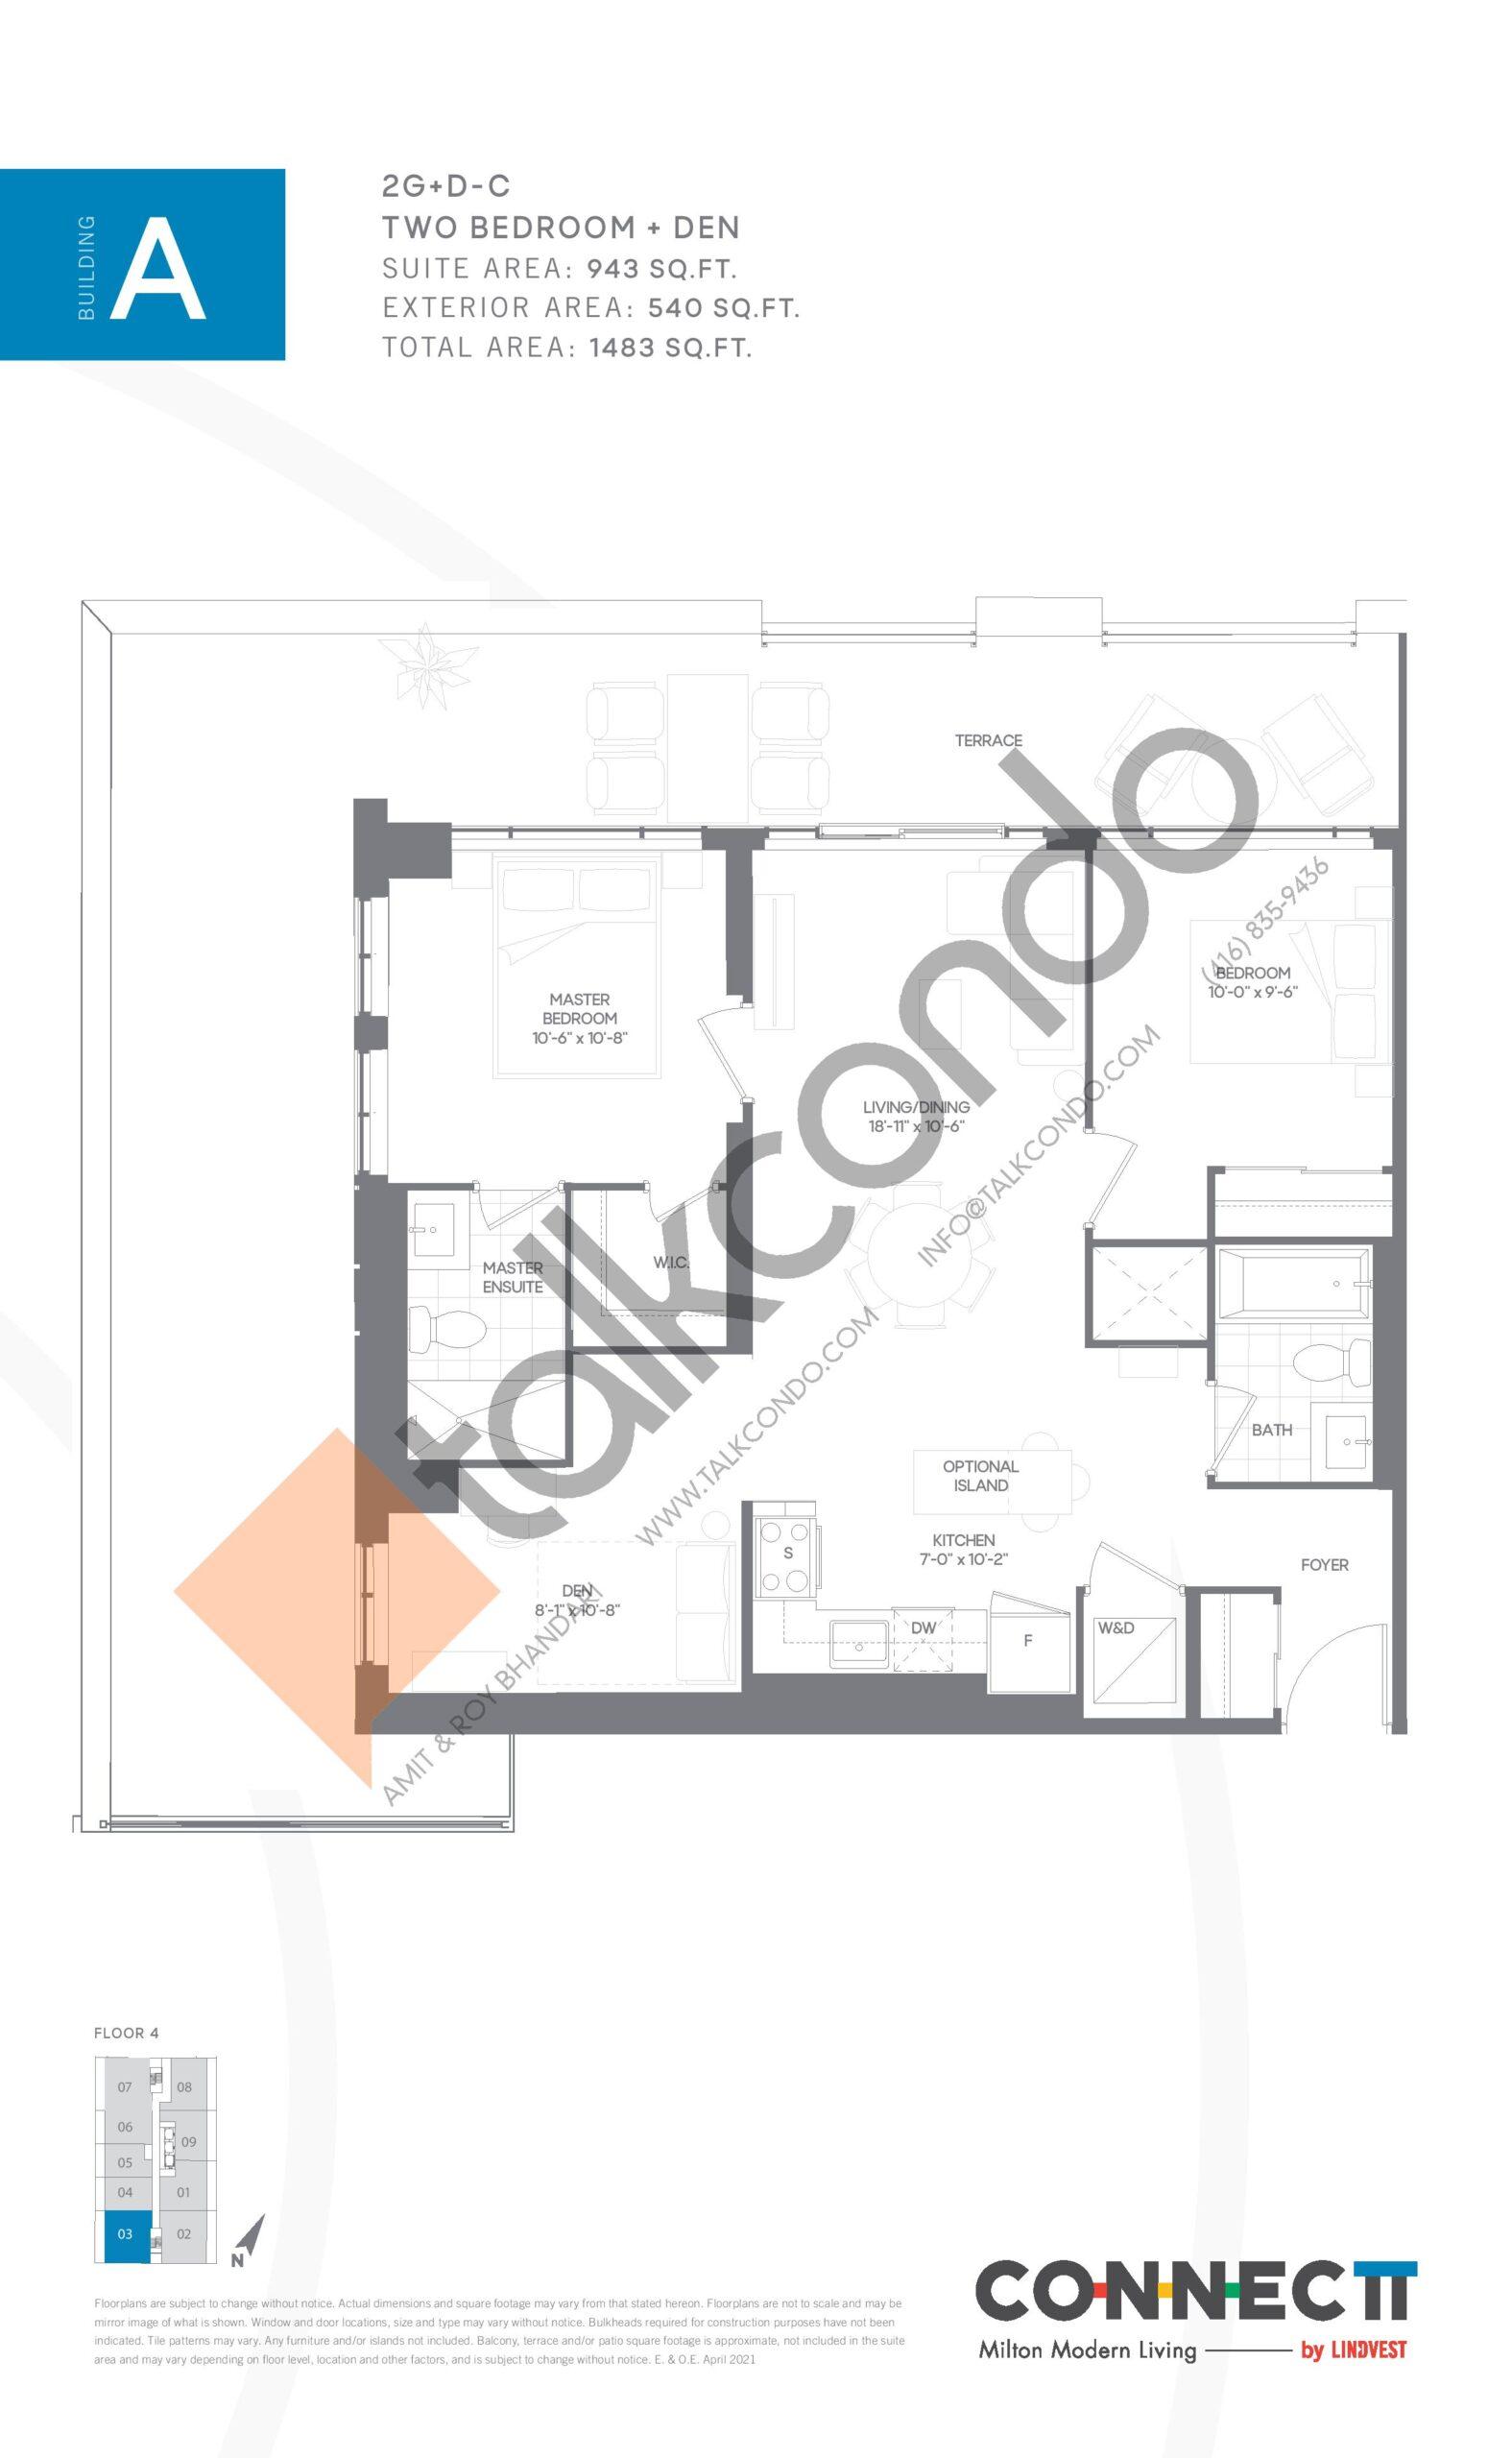 2G+D-C Floor Plan at Connectt Urban Community Condos - 943 sq.ft